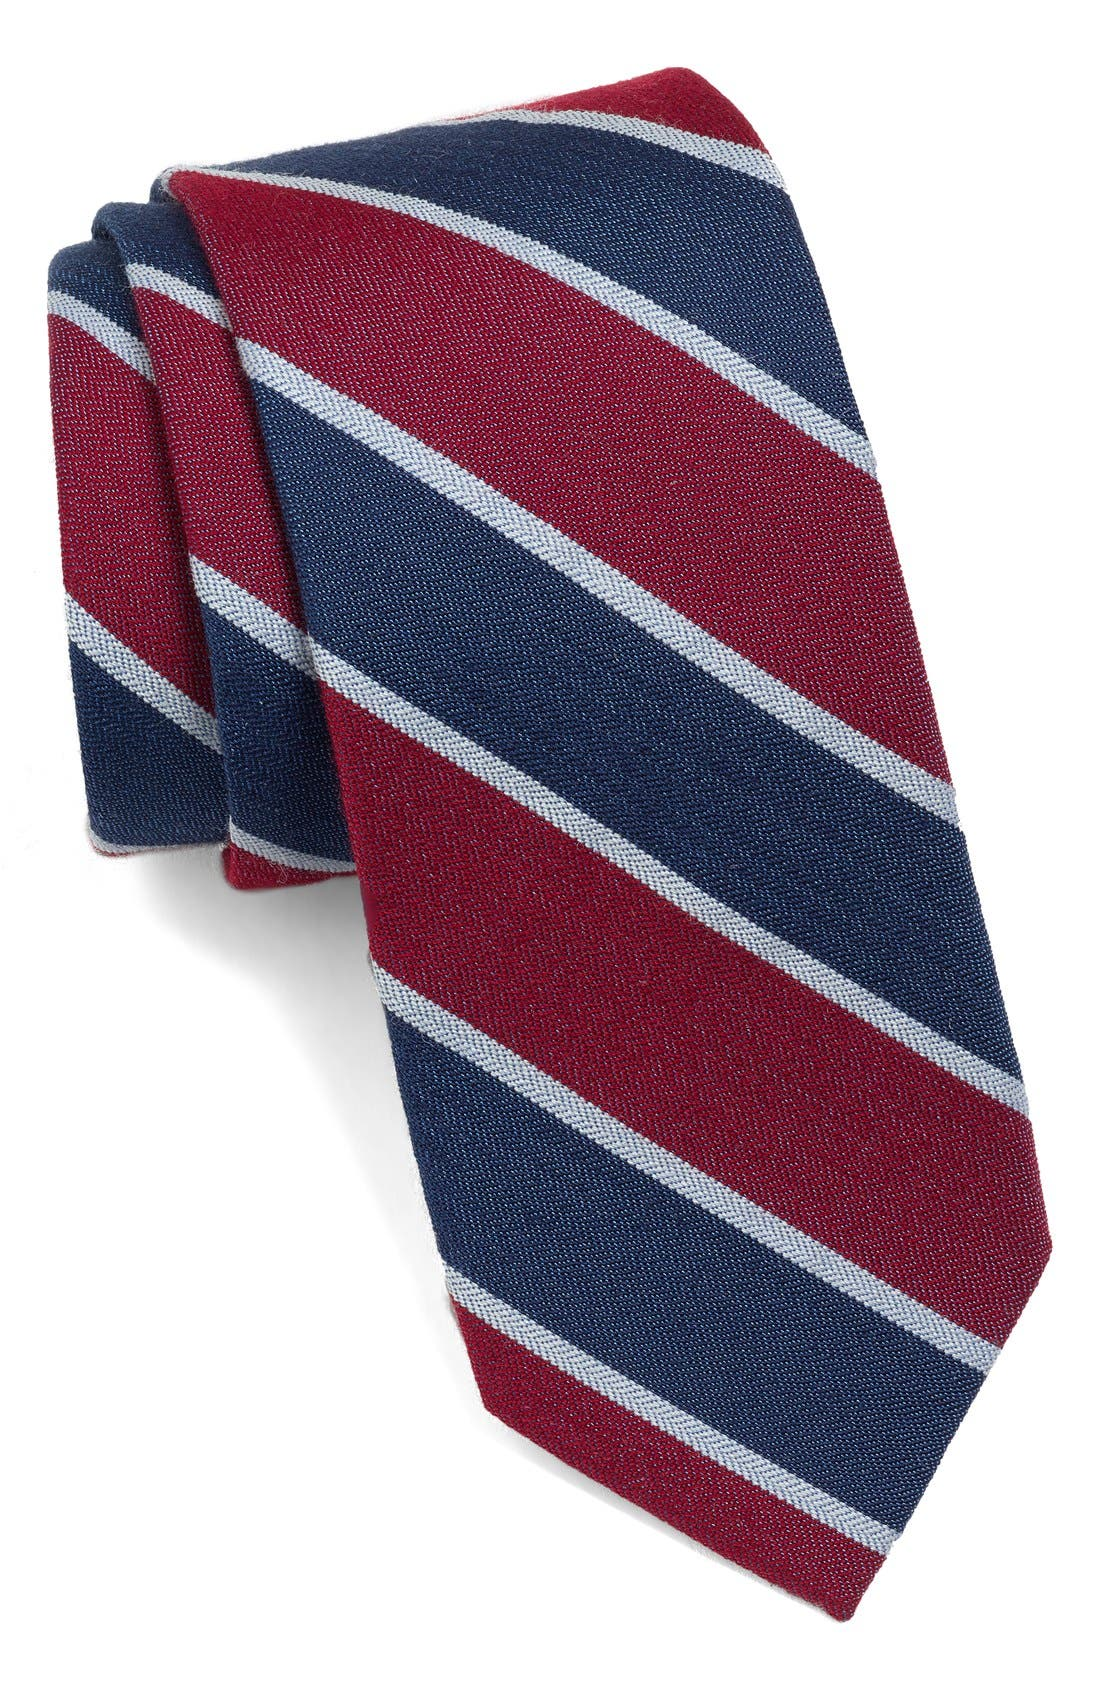 Main Image - 1901 Woven Cotton Tie